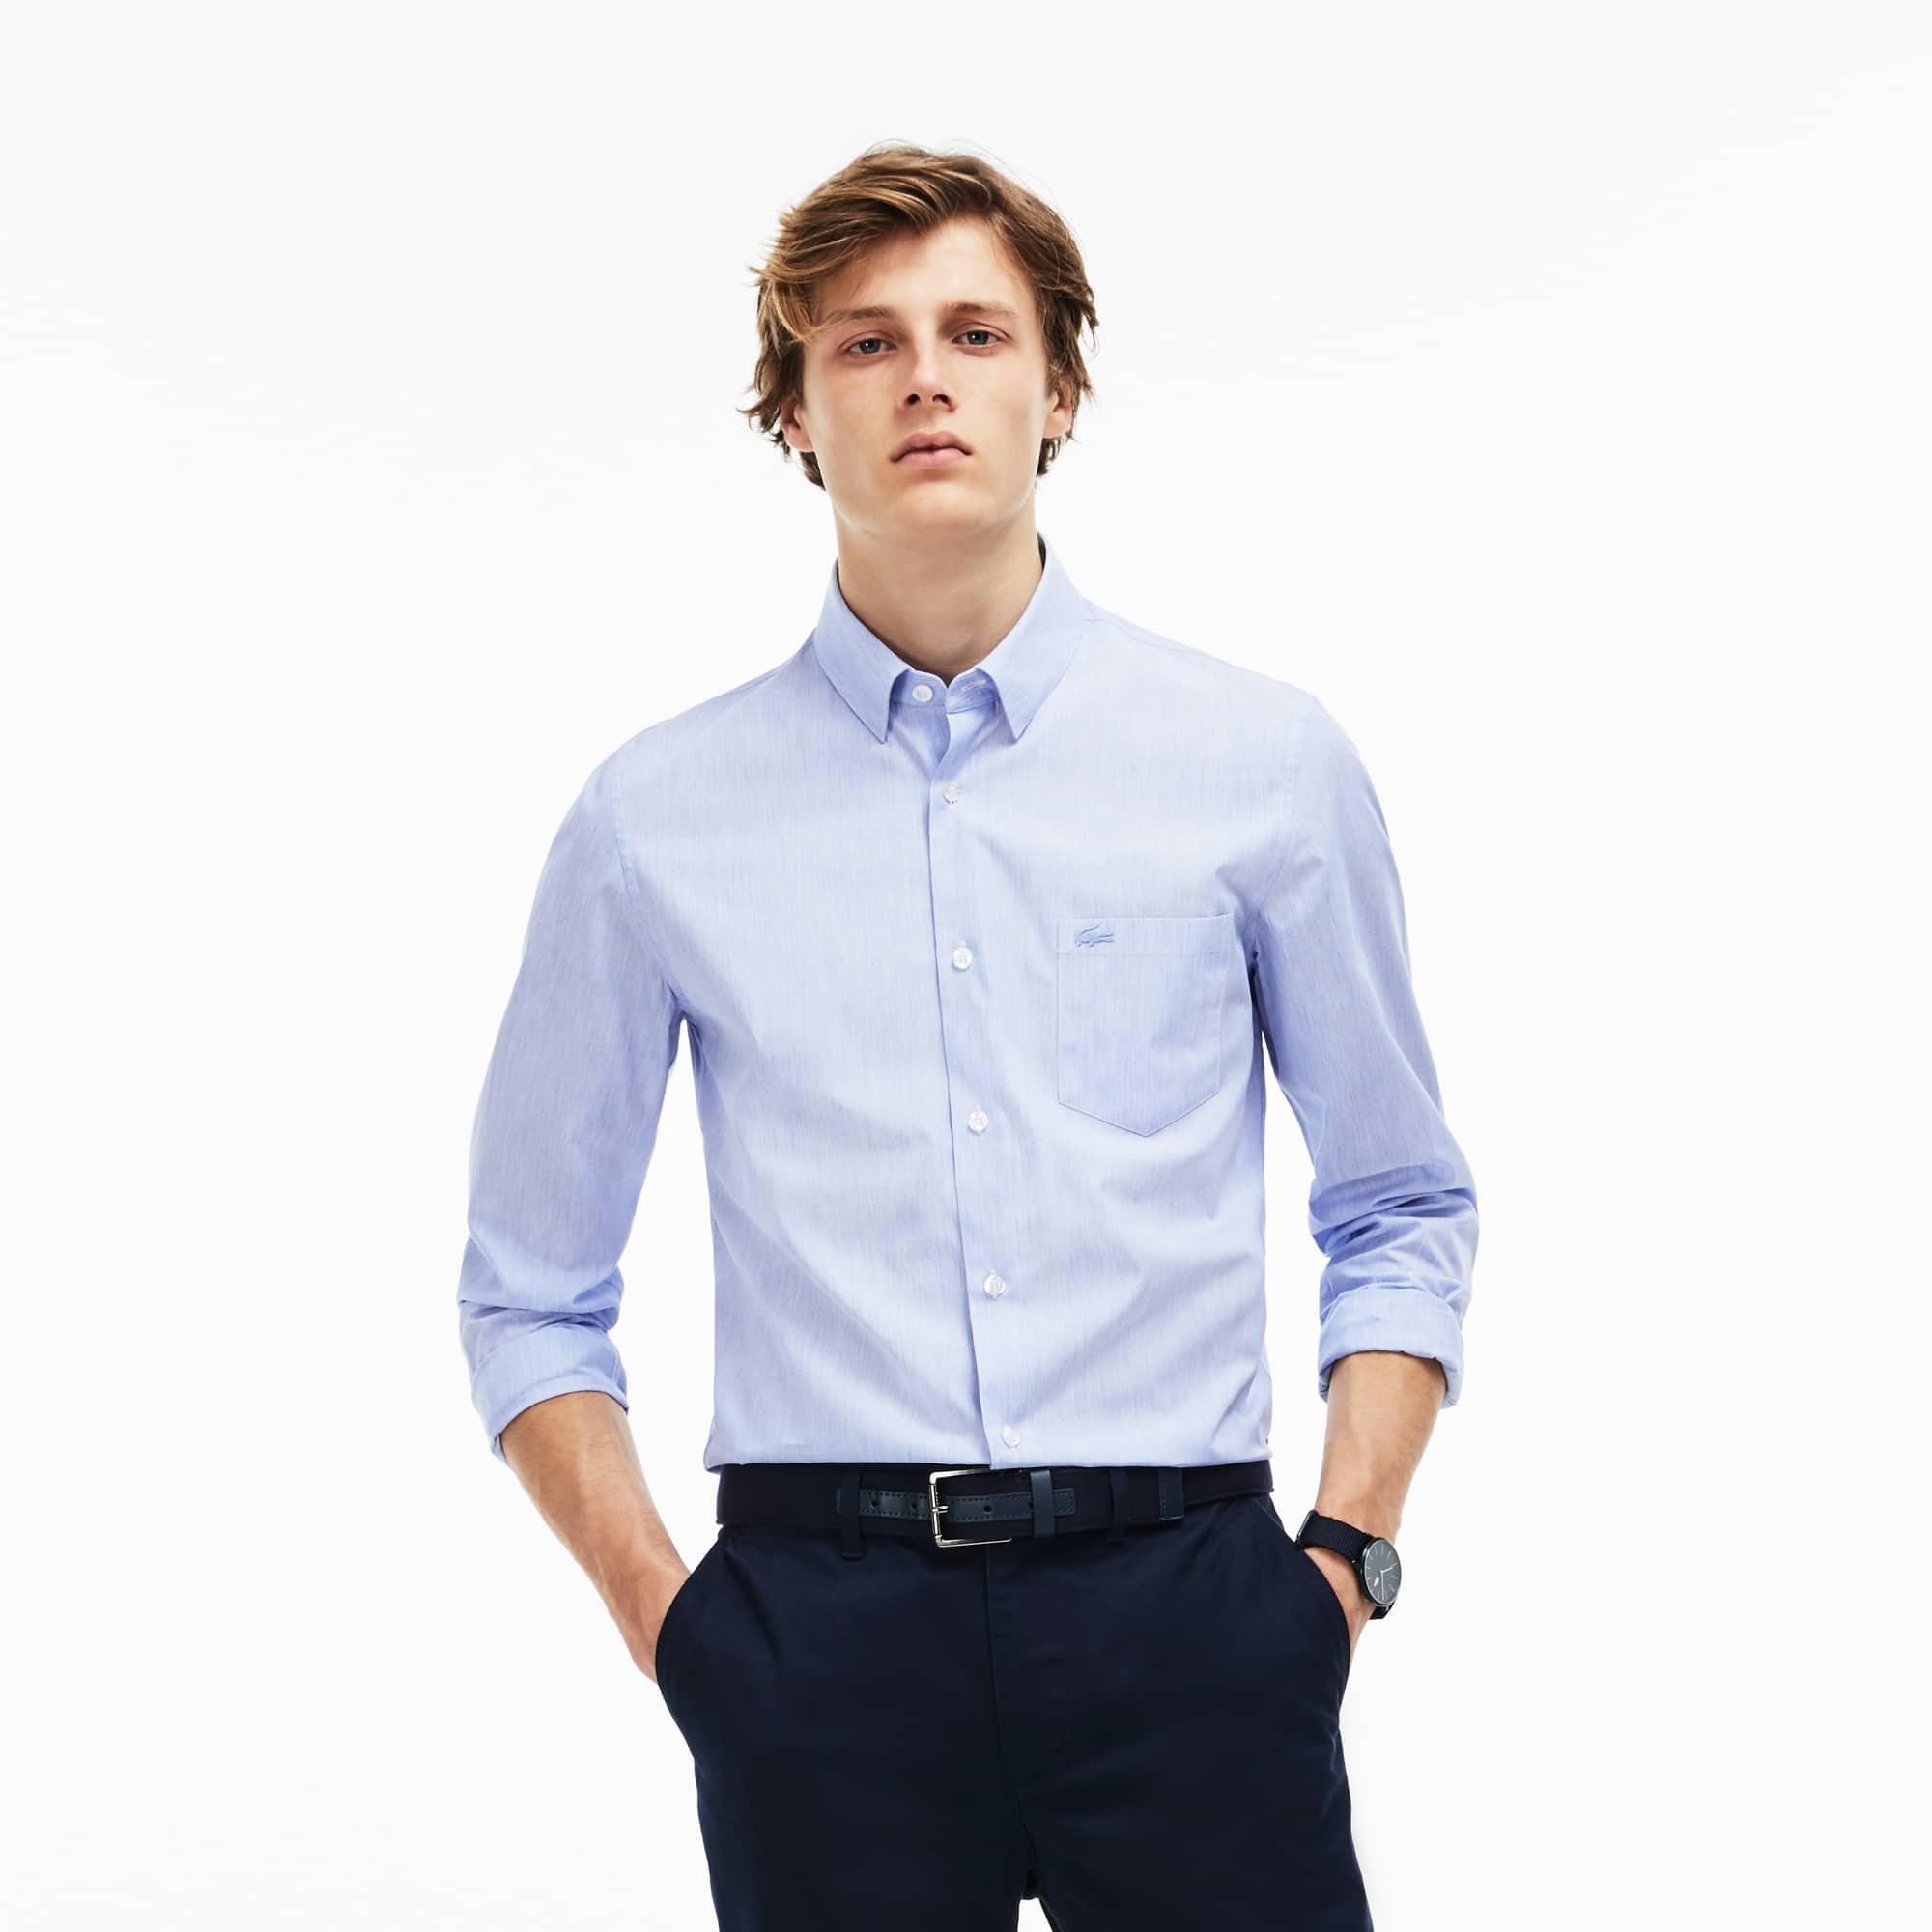 Camisas   Moda Masculina   LACOSTE 7517cc5e50